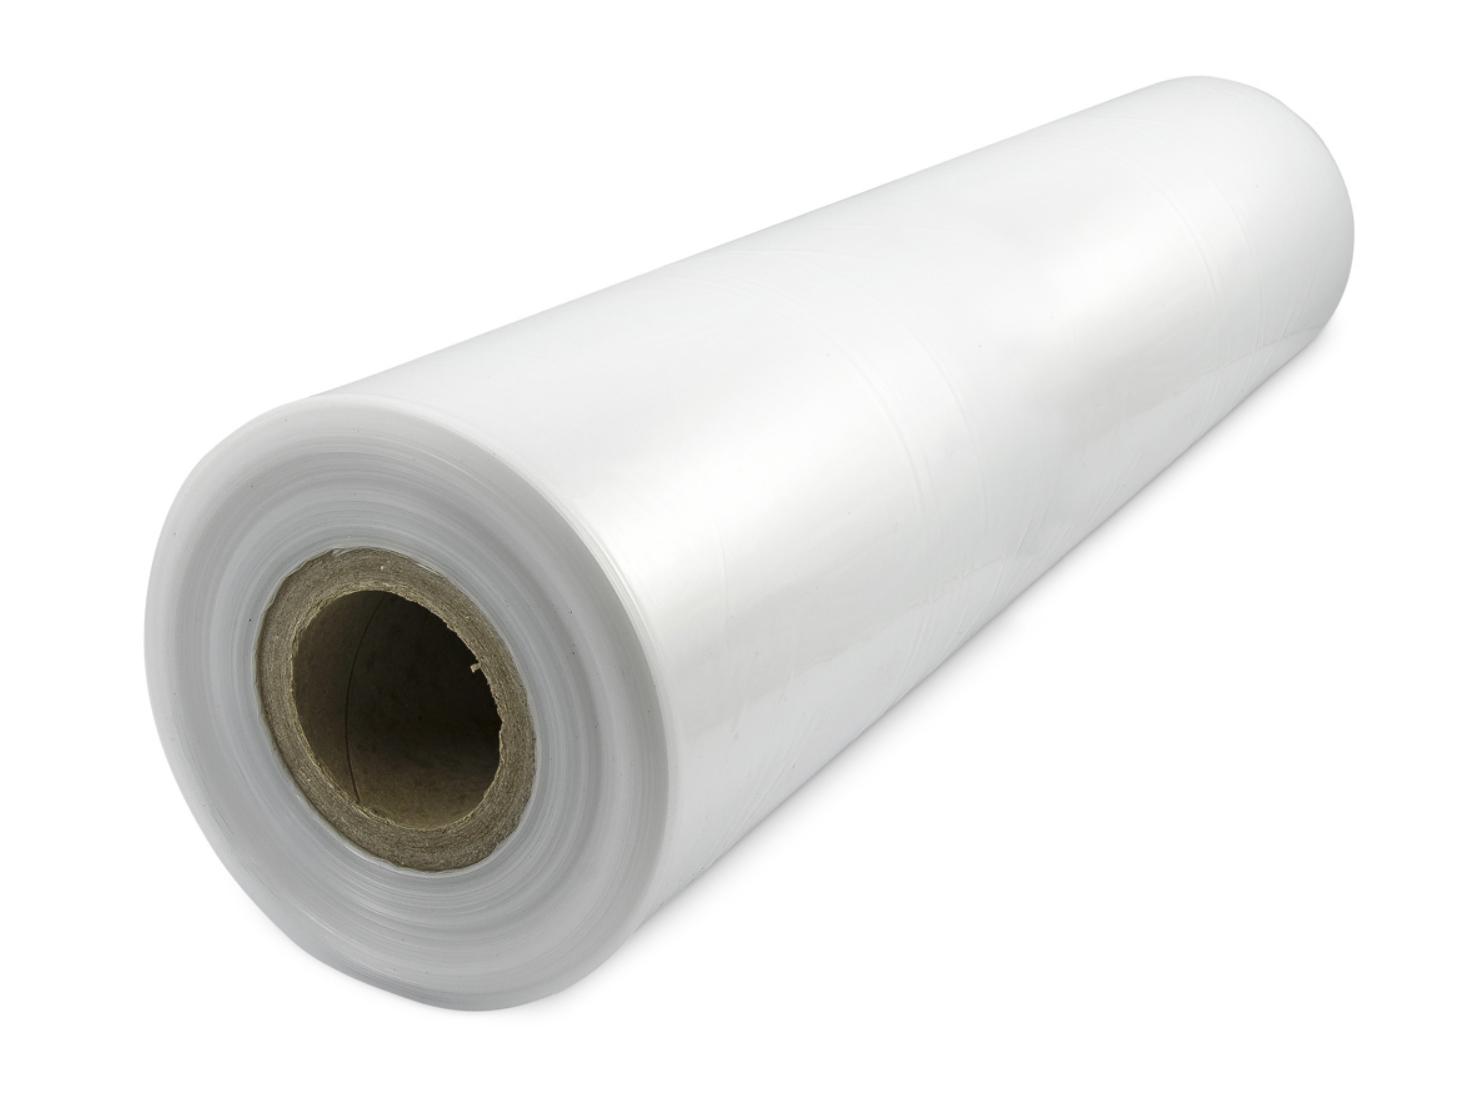 Plochá PE fólie síla 45micron, šířka 1000mm, délka 50m